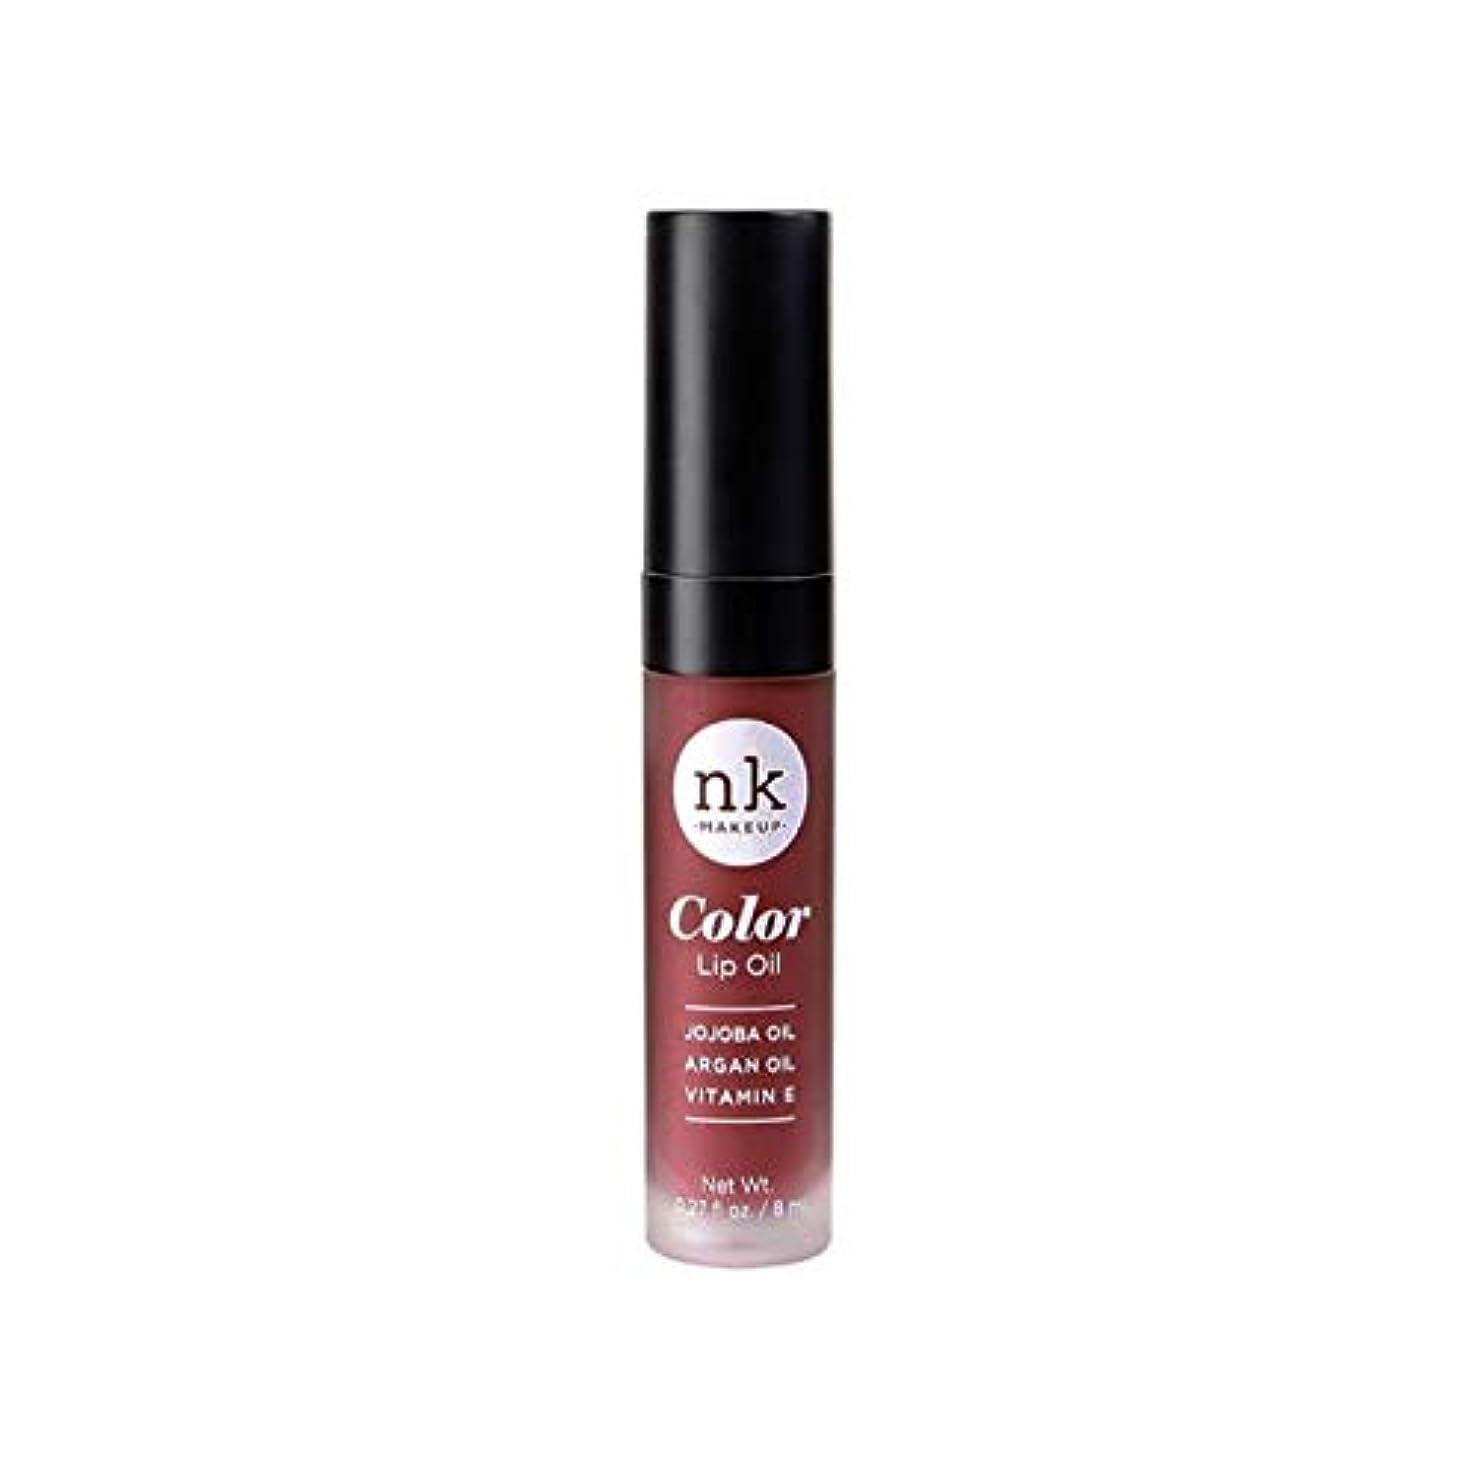 NICKA K Color Lip Oil - Mauvette (並行輸入品)